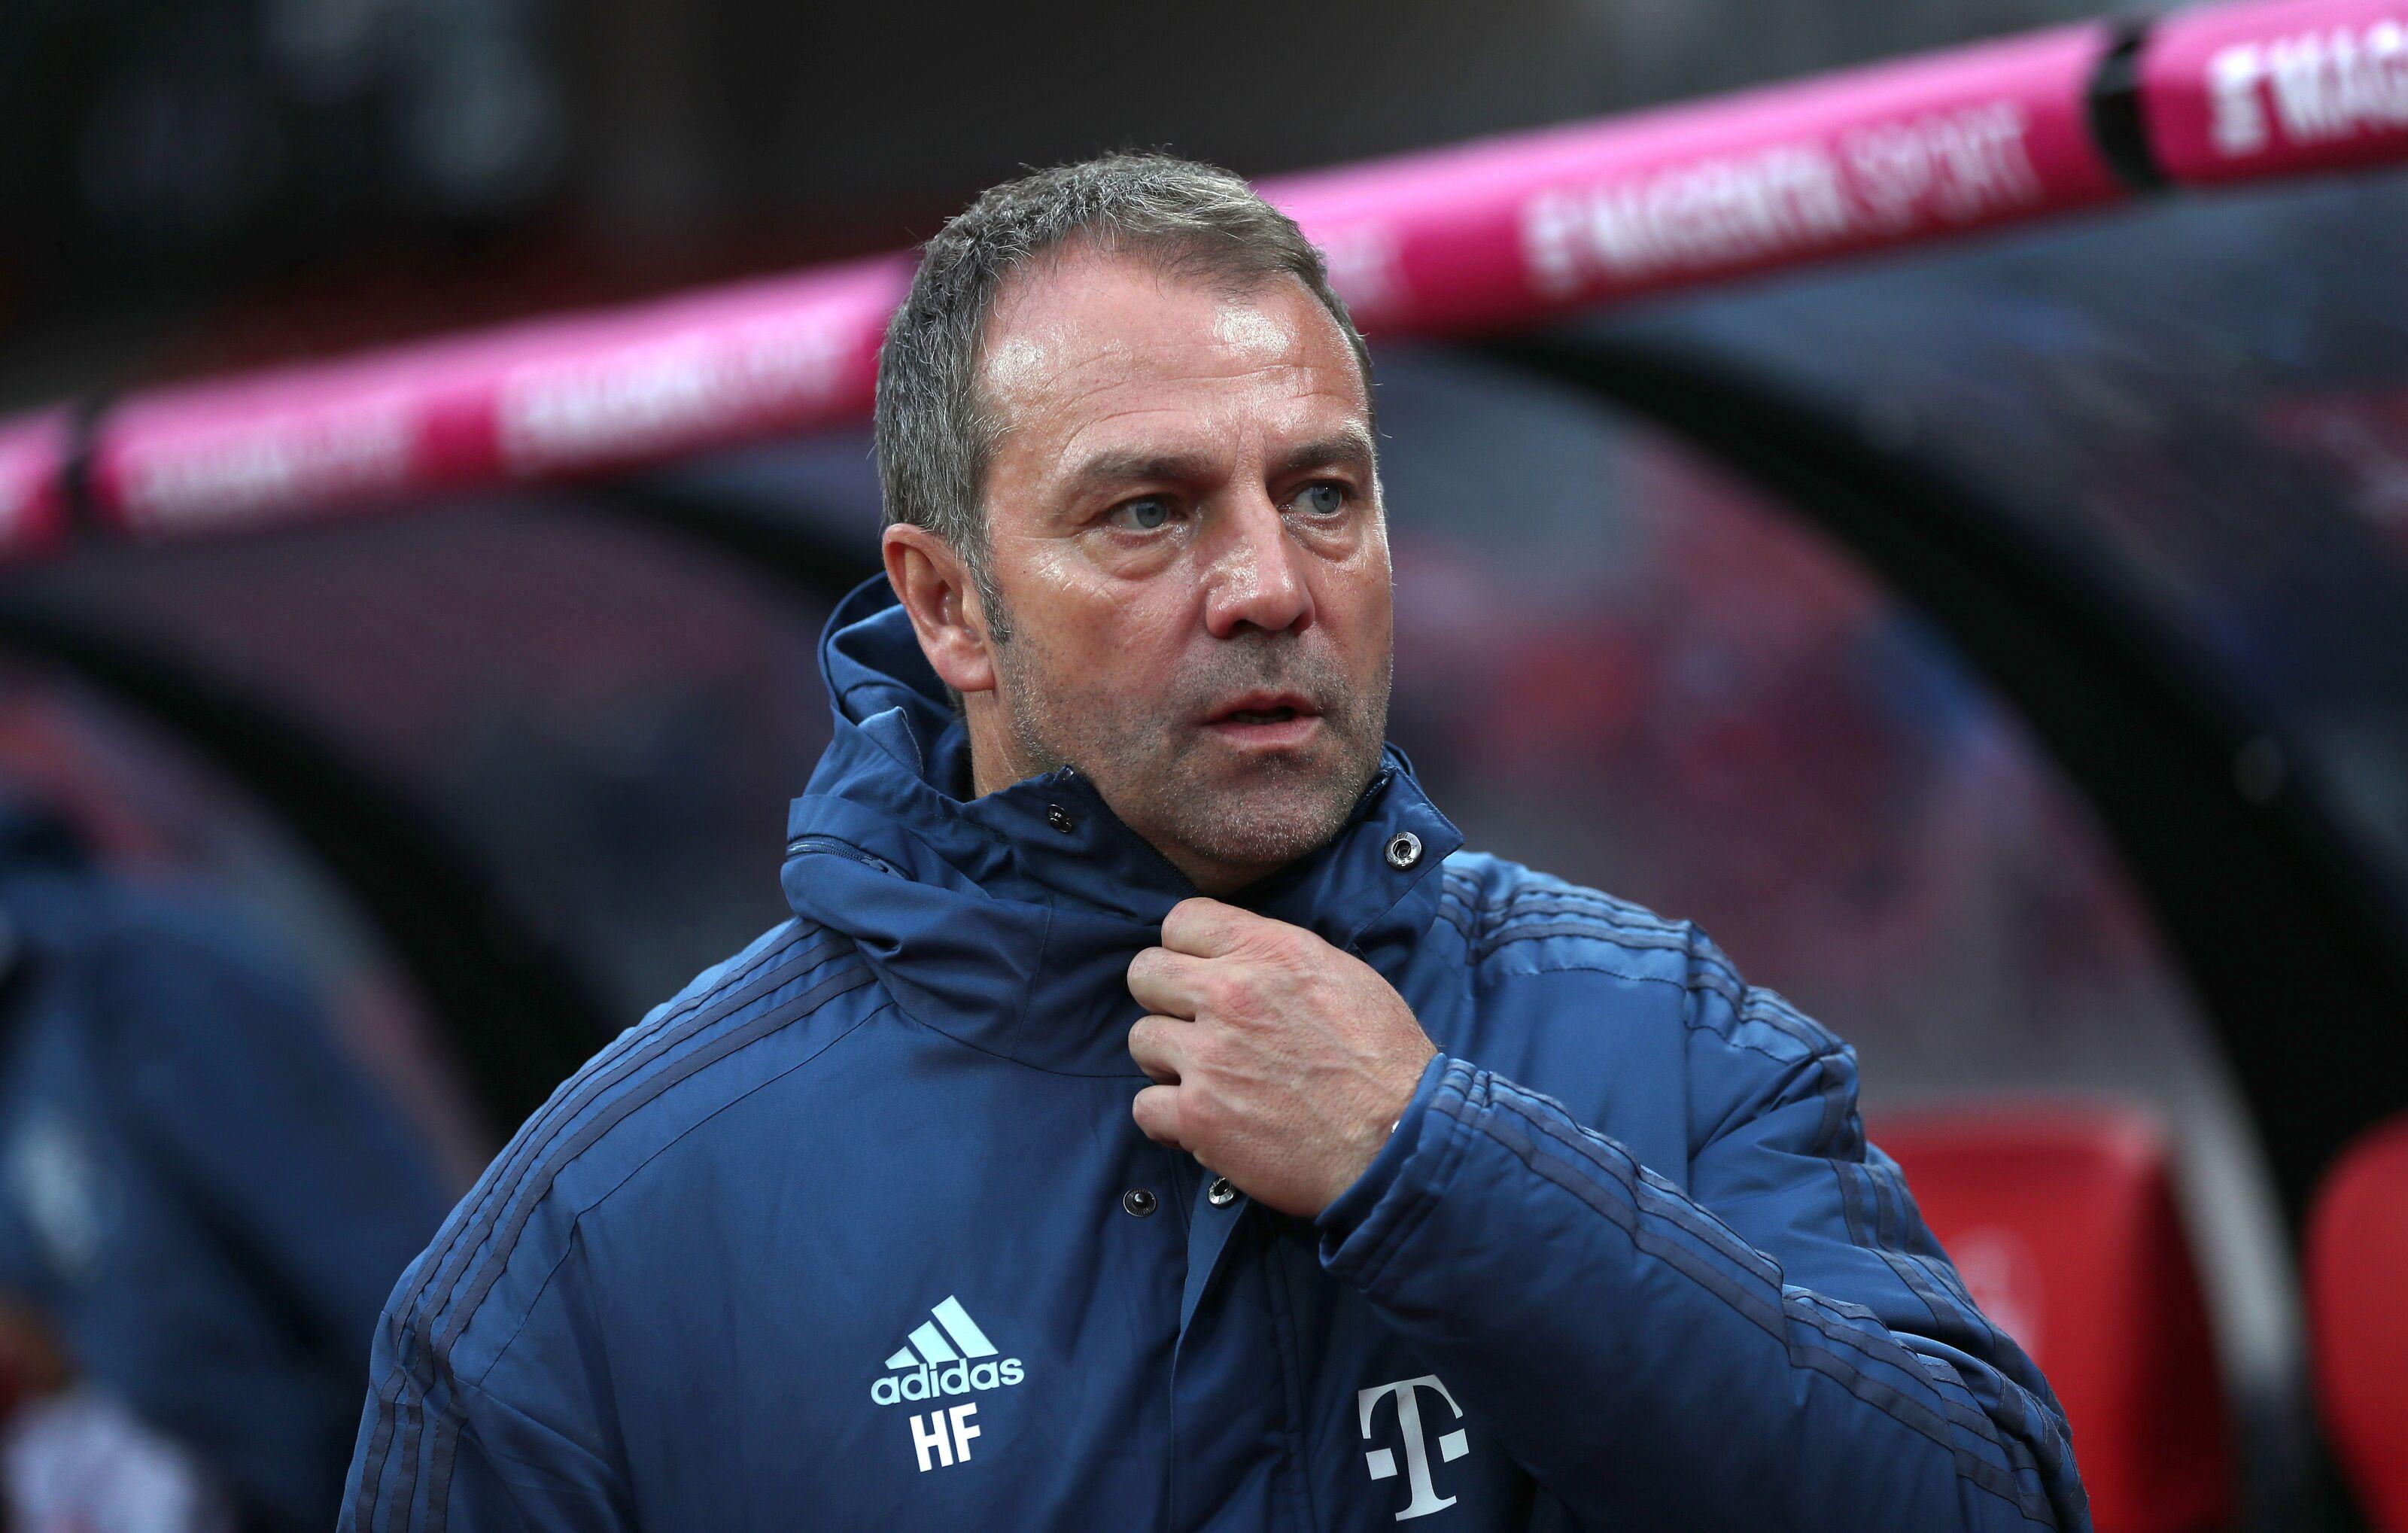 Miroslav Klose praises Hansi Flick's tactical acumen at Bayern Munich